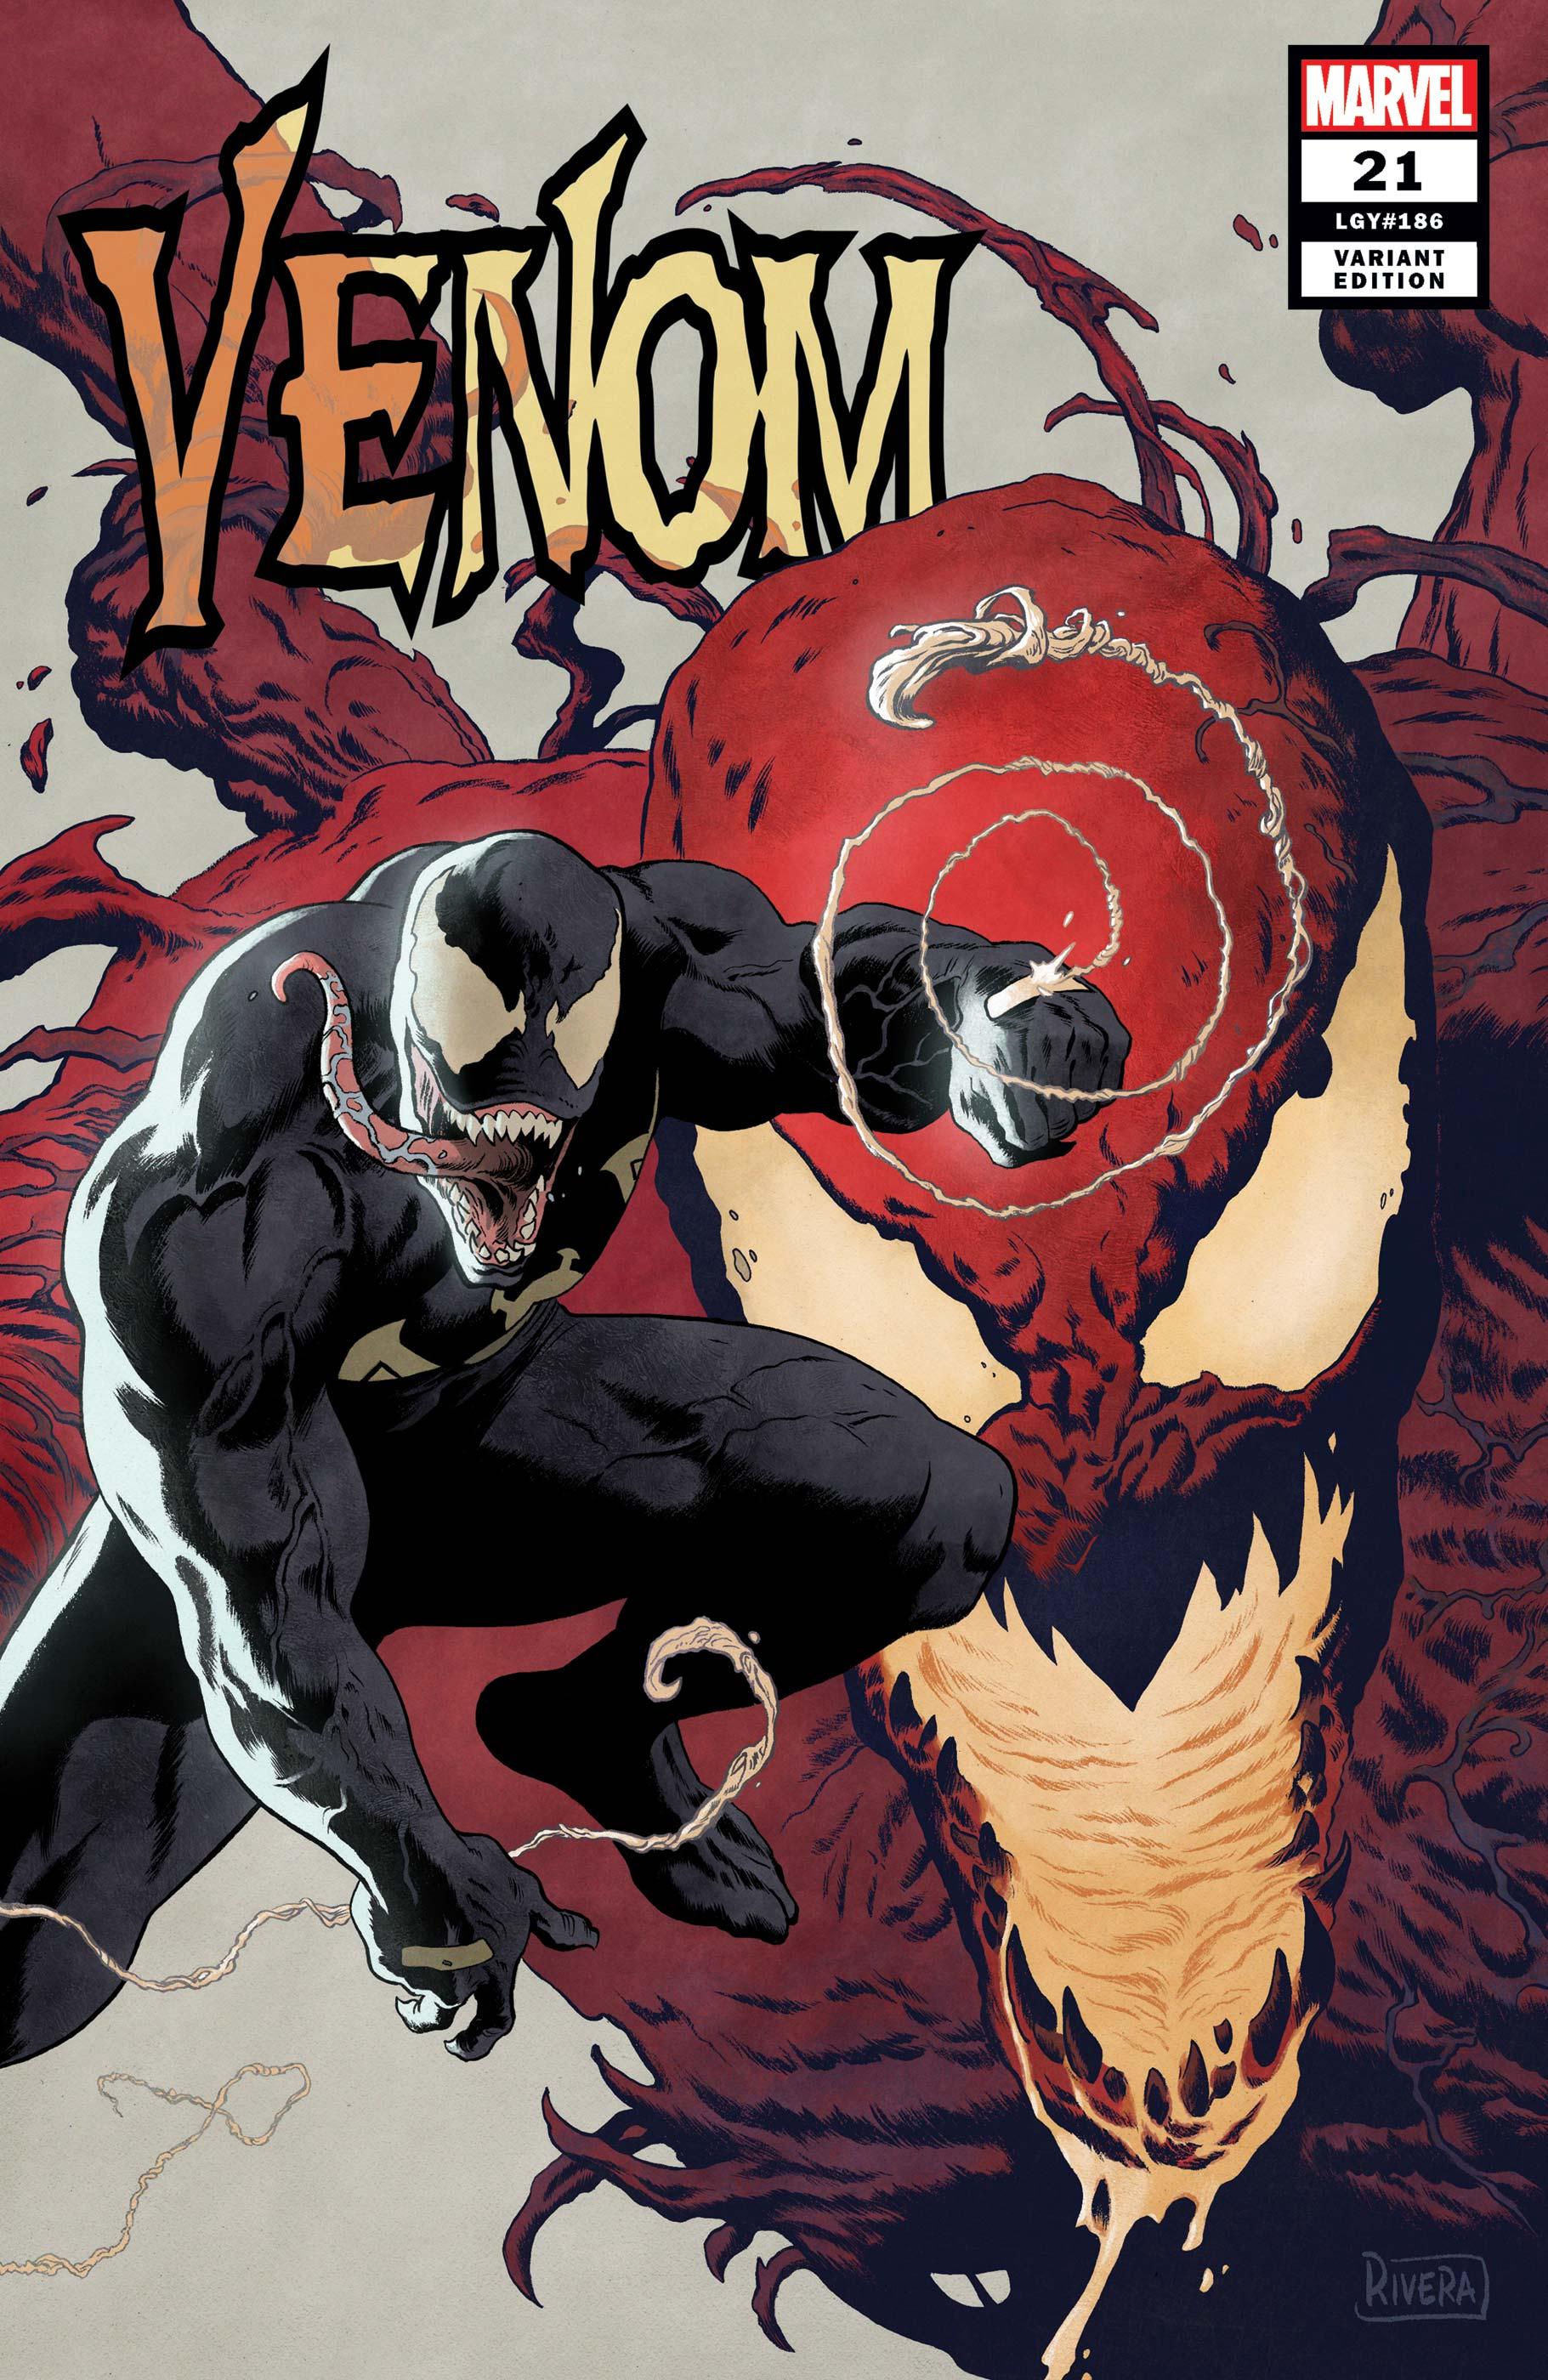 Venom 2018 21 Variant Comic Issues Marvel